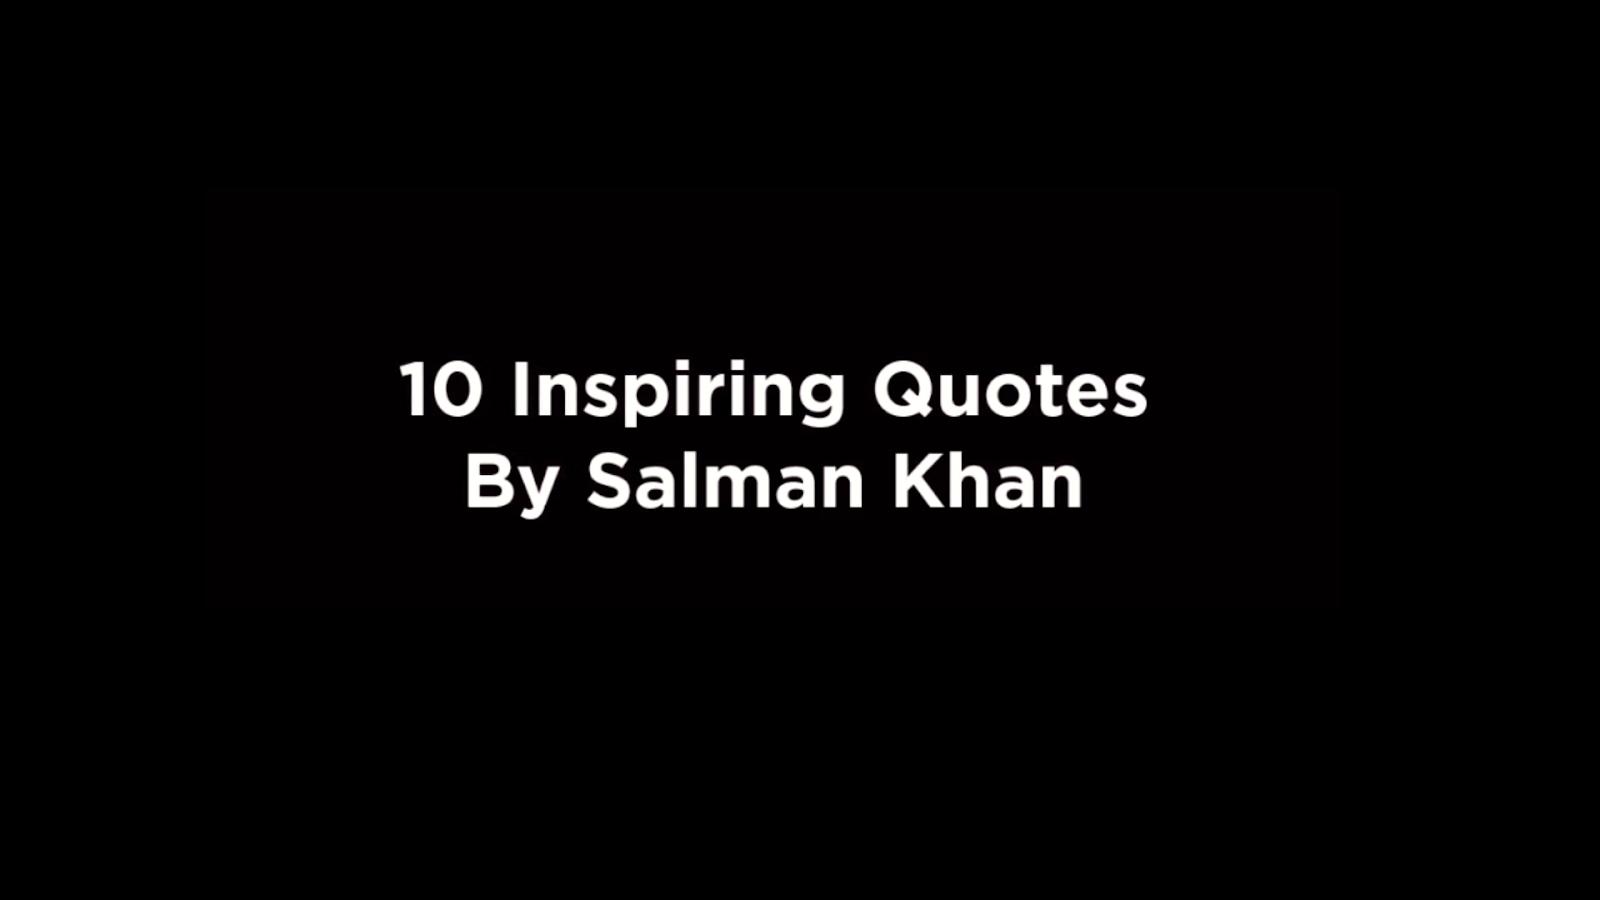 10 Inspiring Quotes By Salman Khan [video]